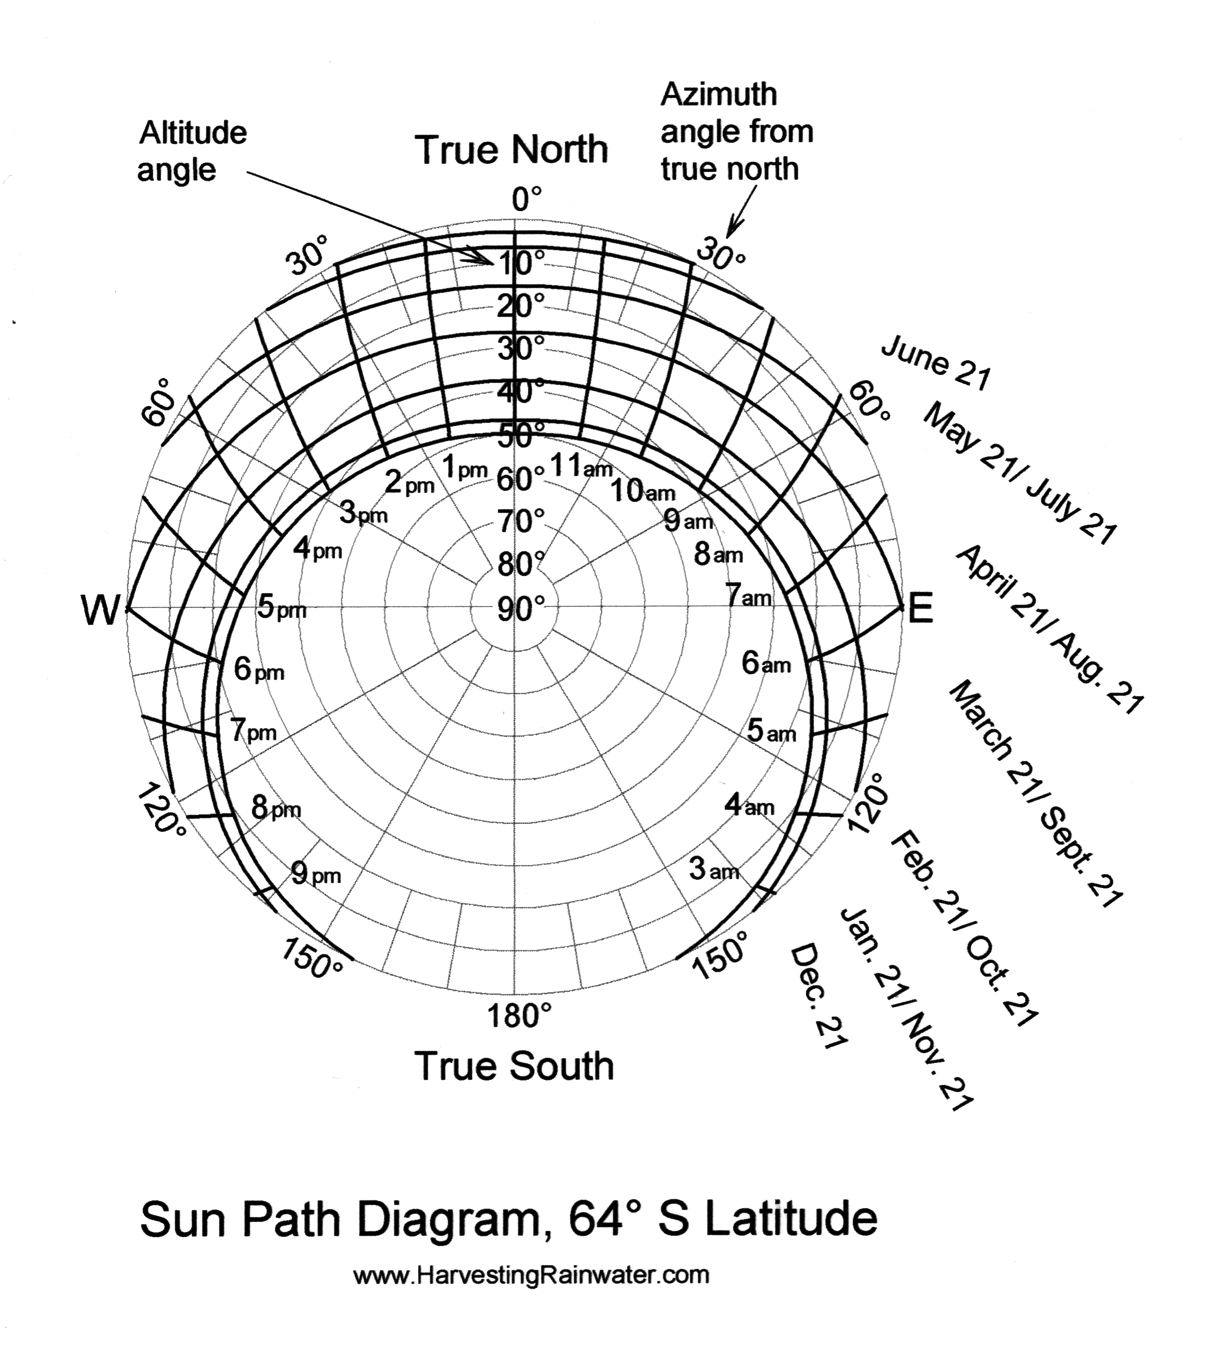 Sun Path Diagram 64o S Latitude